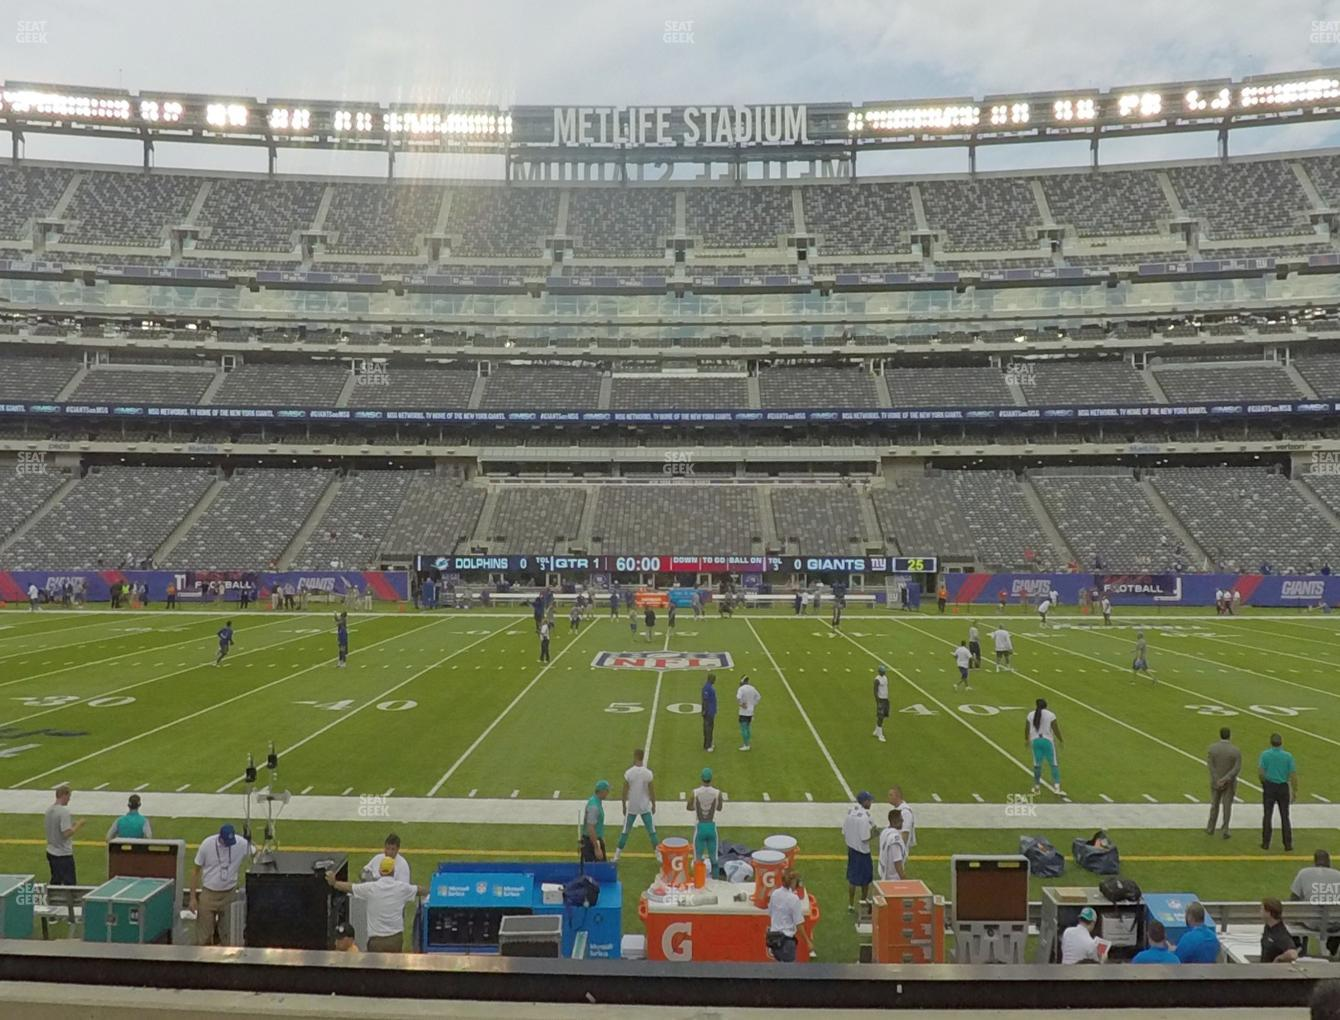 Wholesale MetLife Stadium Section 139 Seat Views | SeatGeek  for cheap